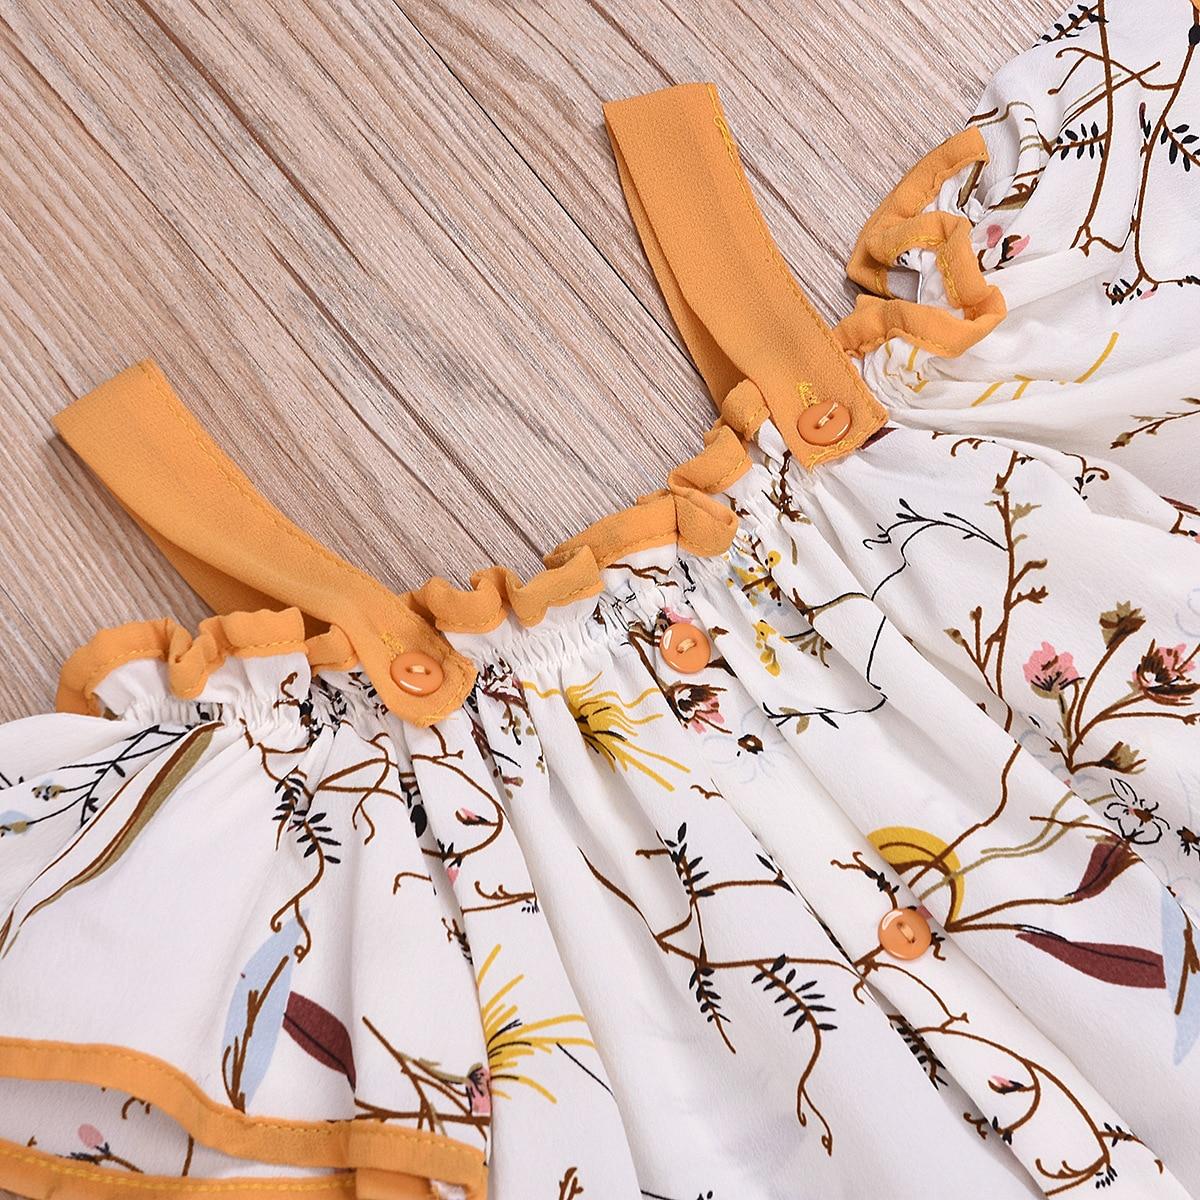 Children's Clothing Summer 2020 Girls Strap Tassel Top Flared Pants Suit D09.29 5